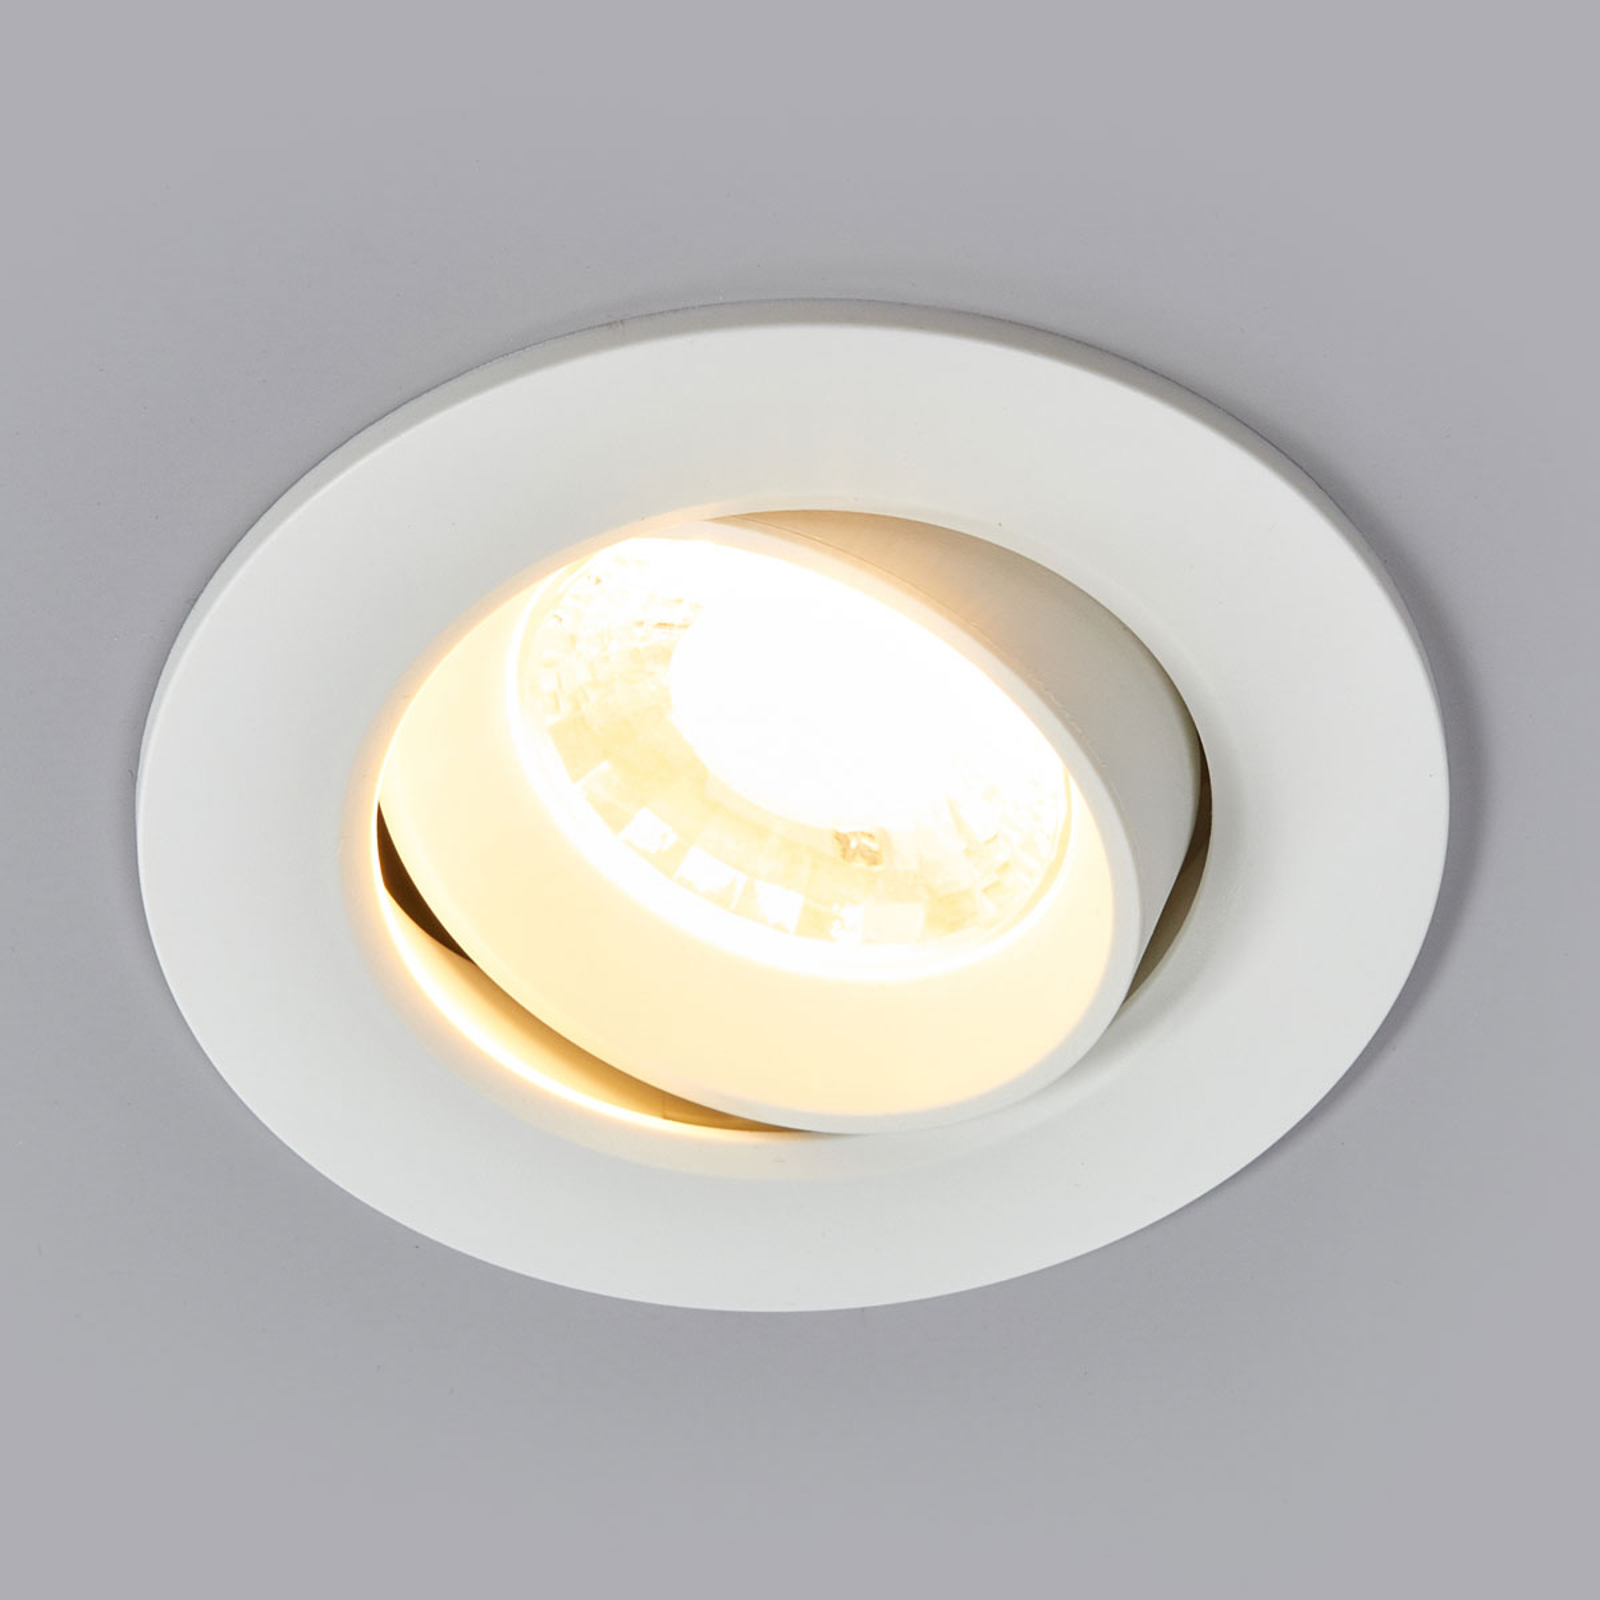 Quentin hvit LED innfellingssspot, 9 W